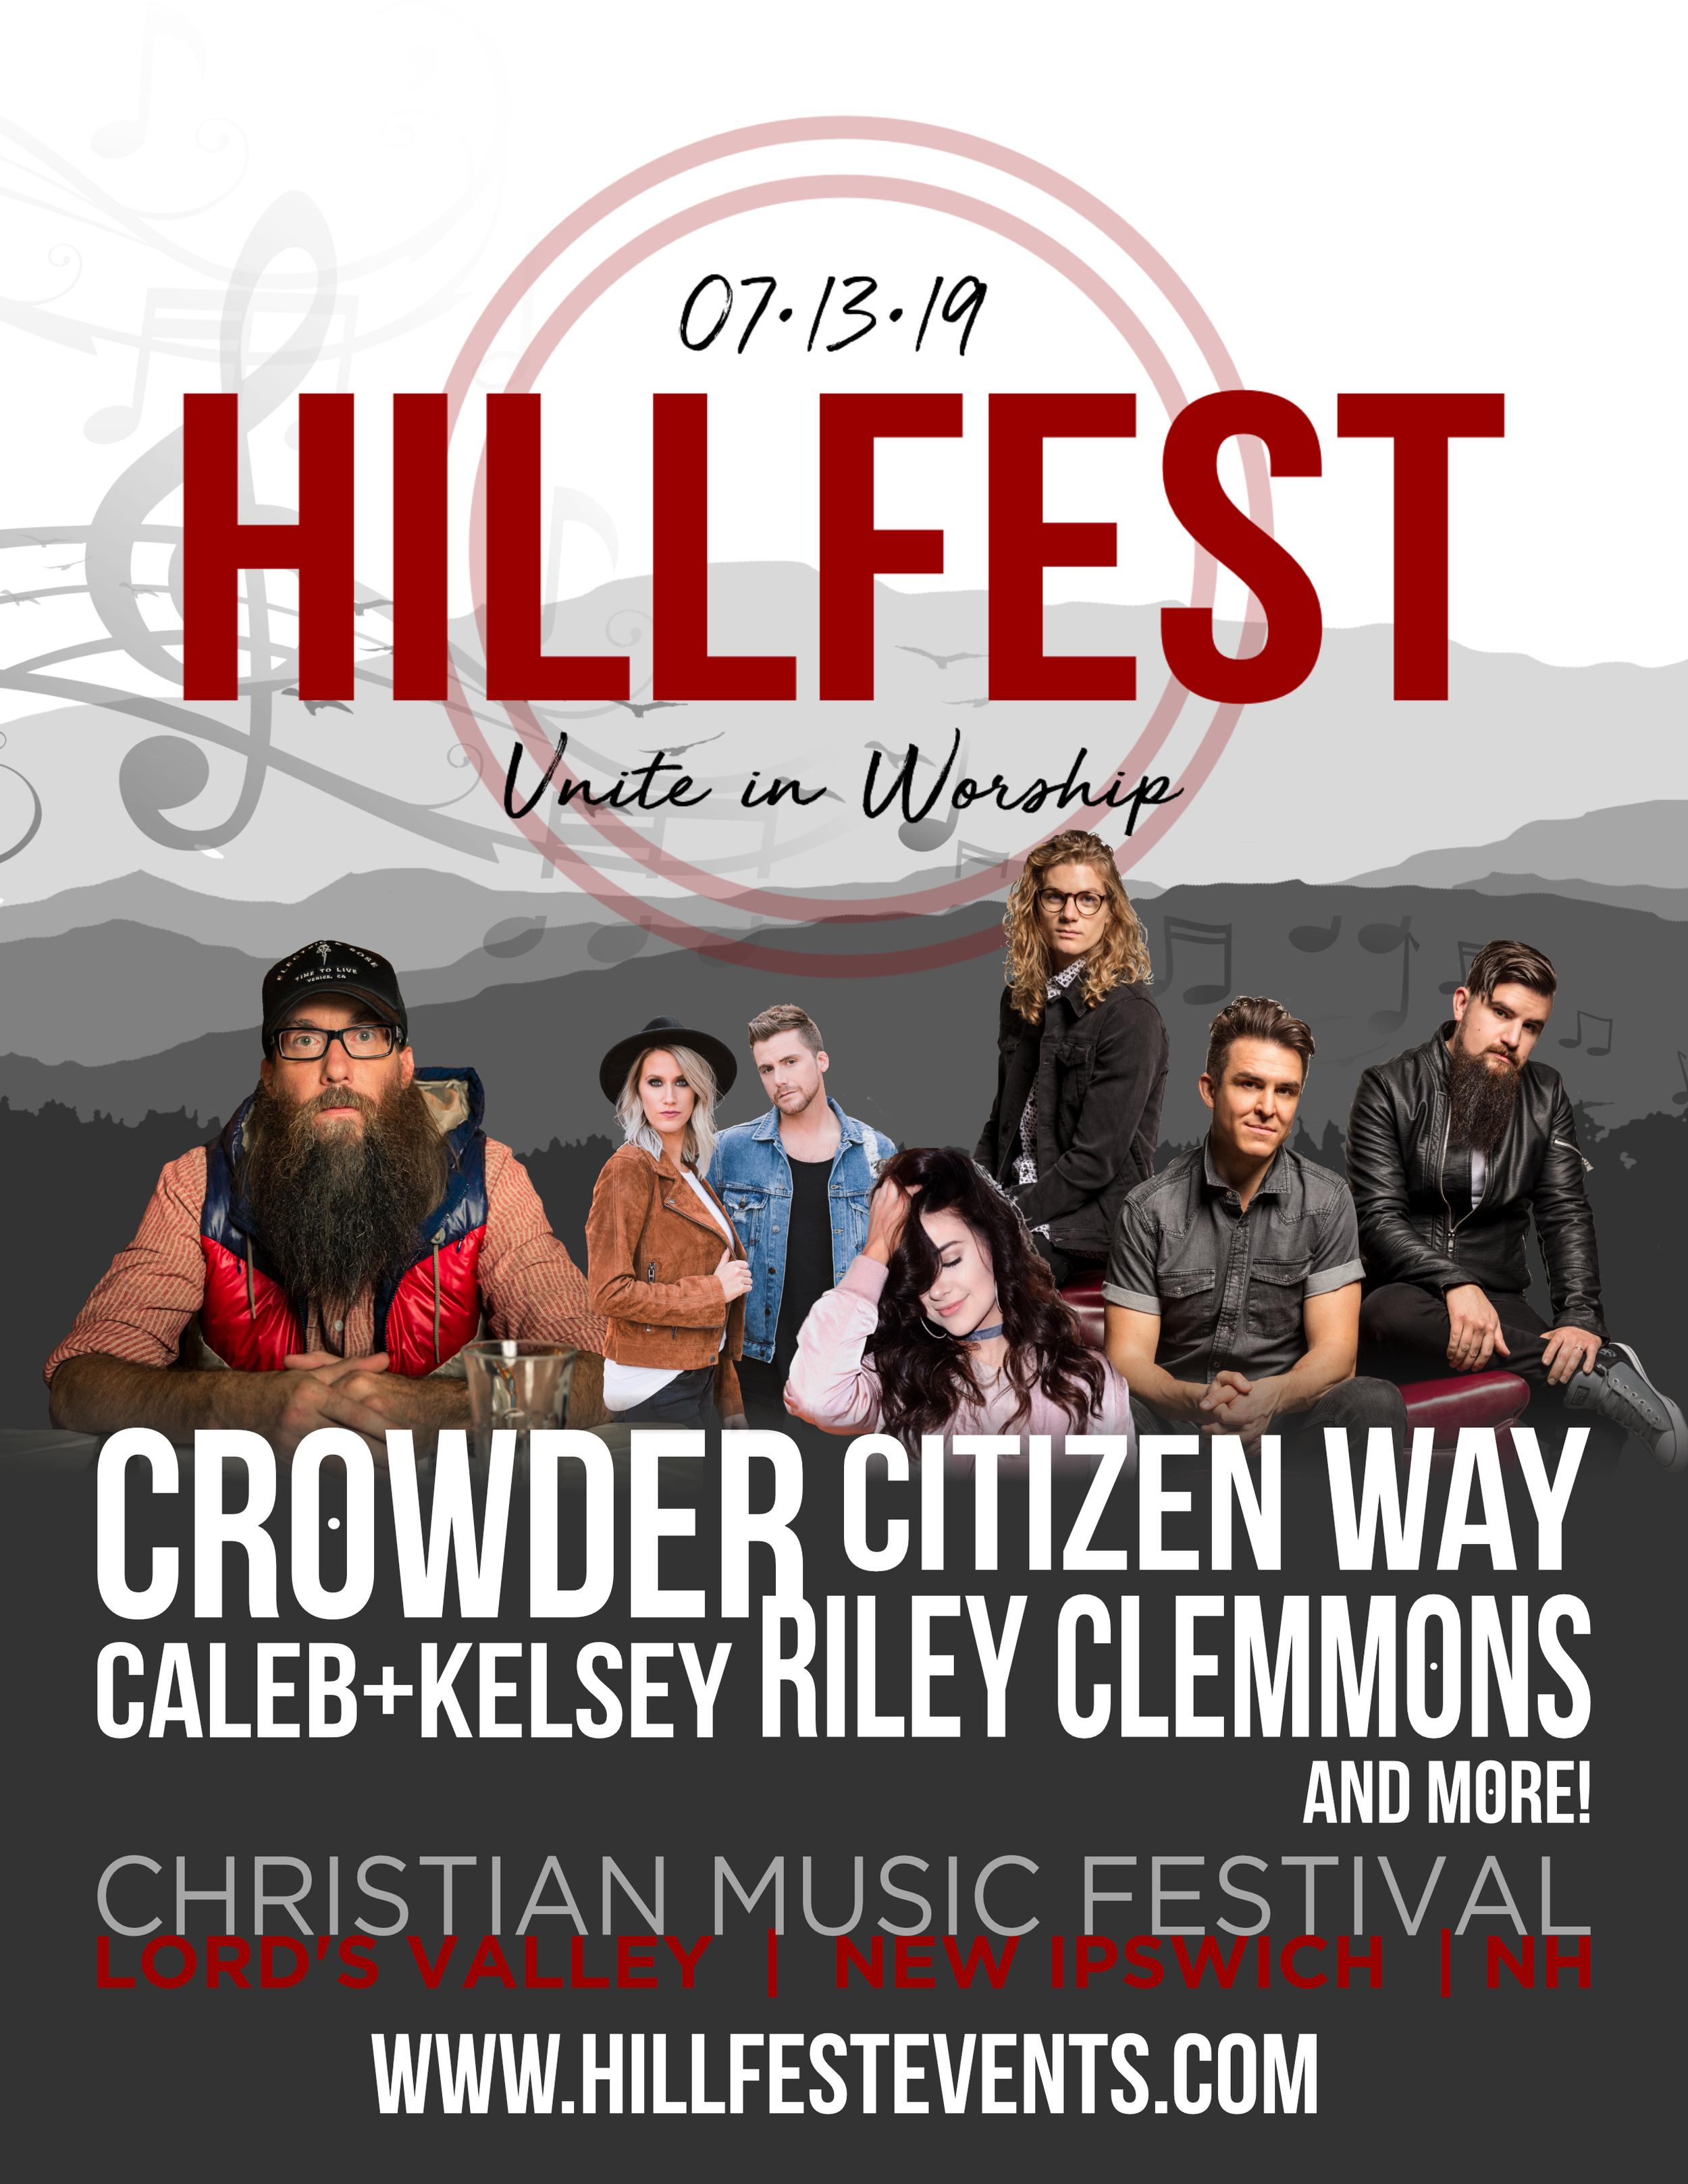 Hillfest 2019_flyer 1 copy.png